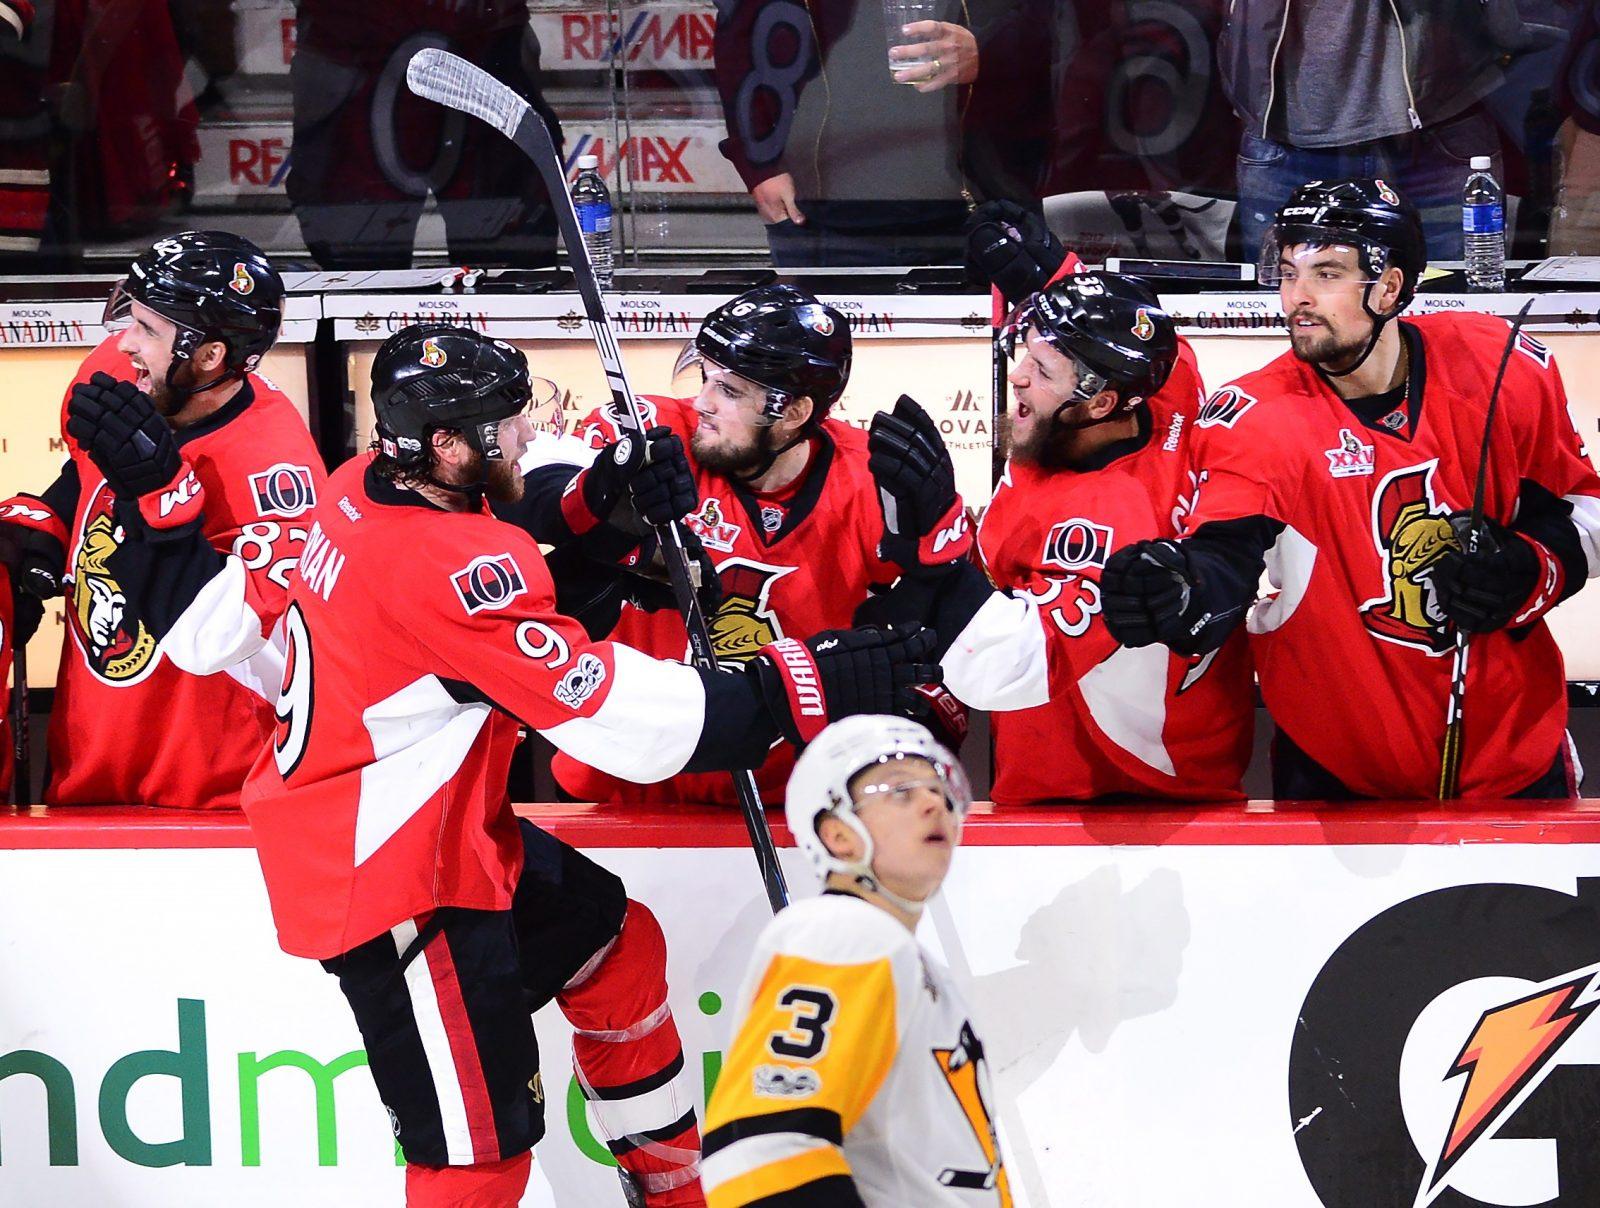 Ottawa Senators Hometown Tour coming to Cornwall Aug. 27